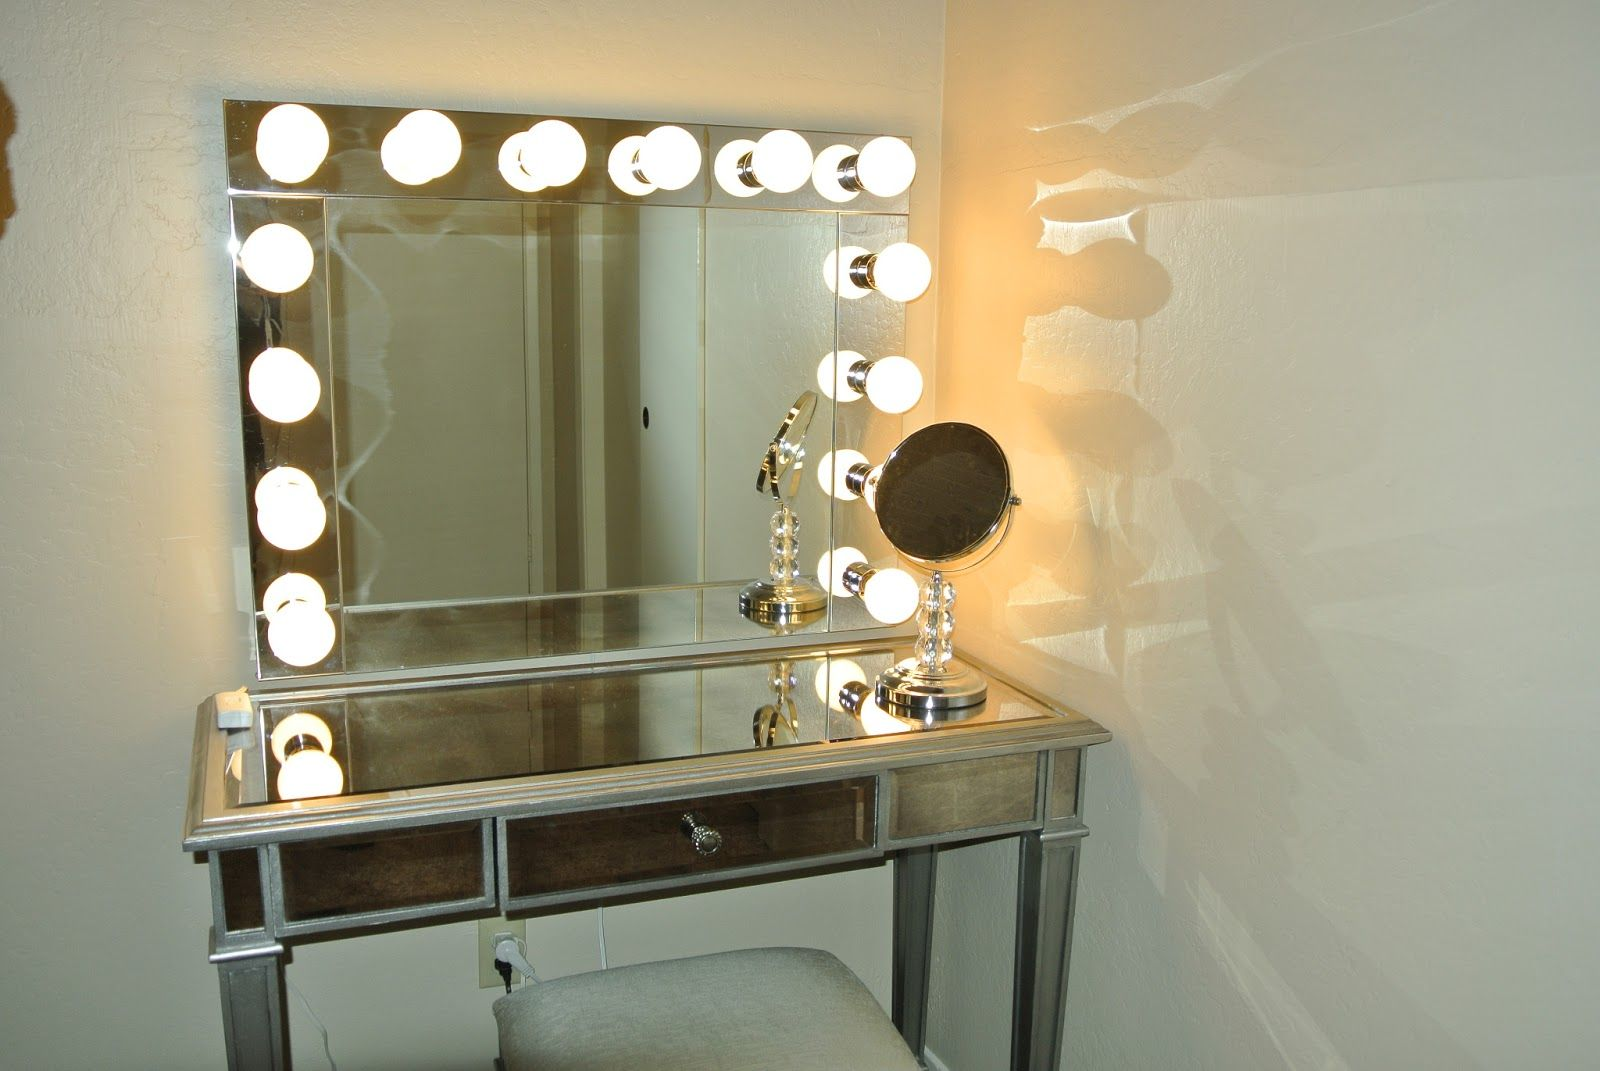 Importance Of Vanity Mirrors With Lights Diy Vanity Mirror